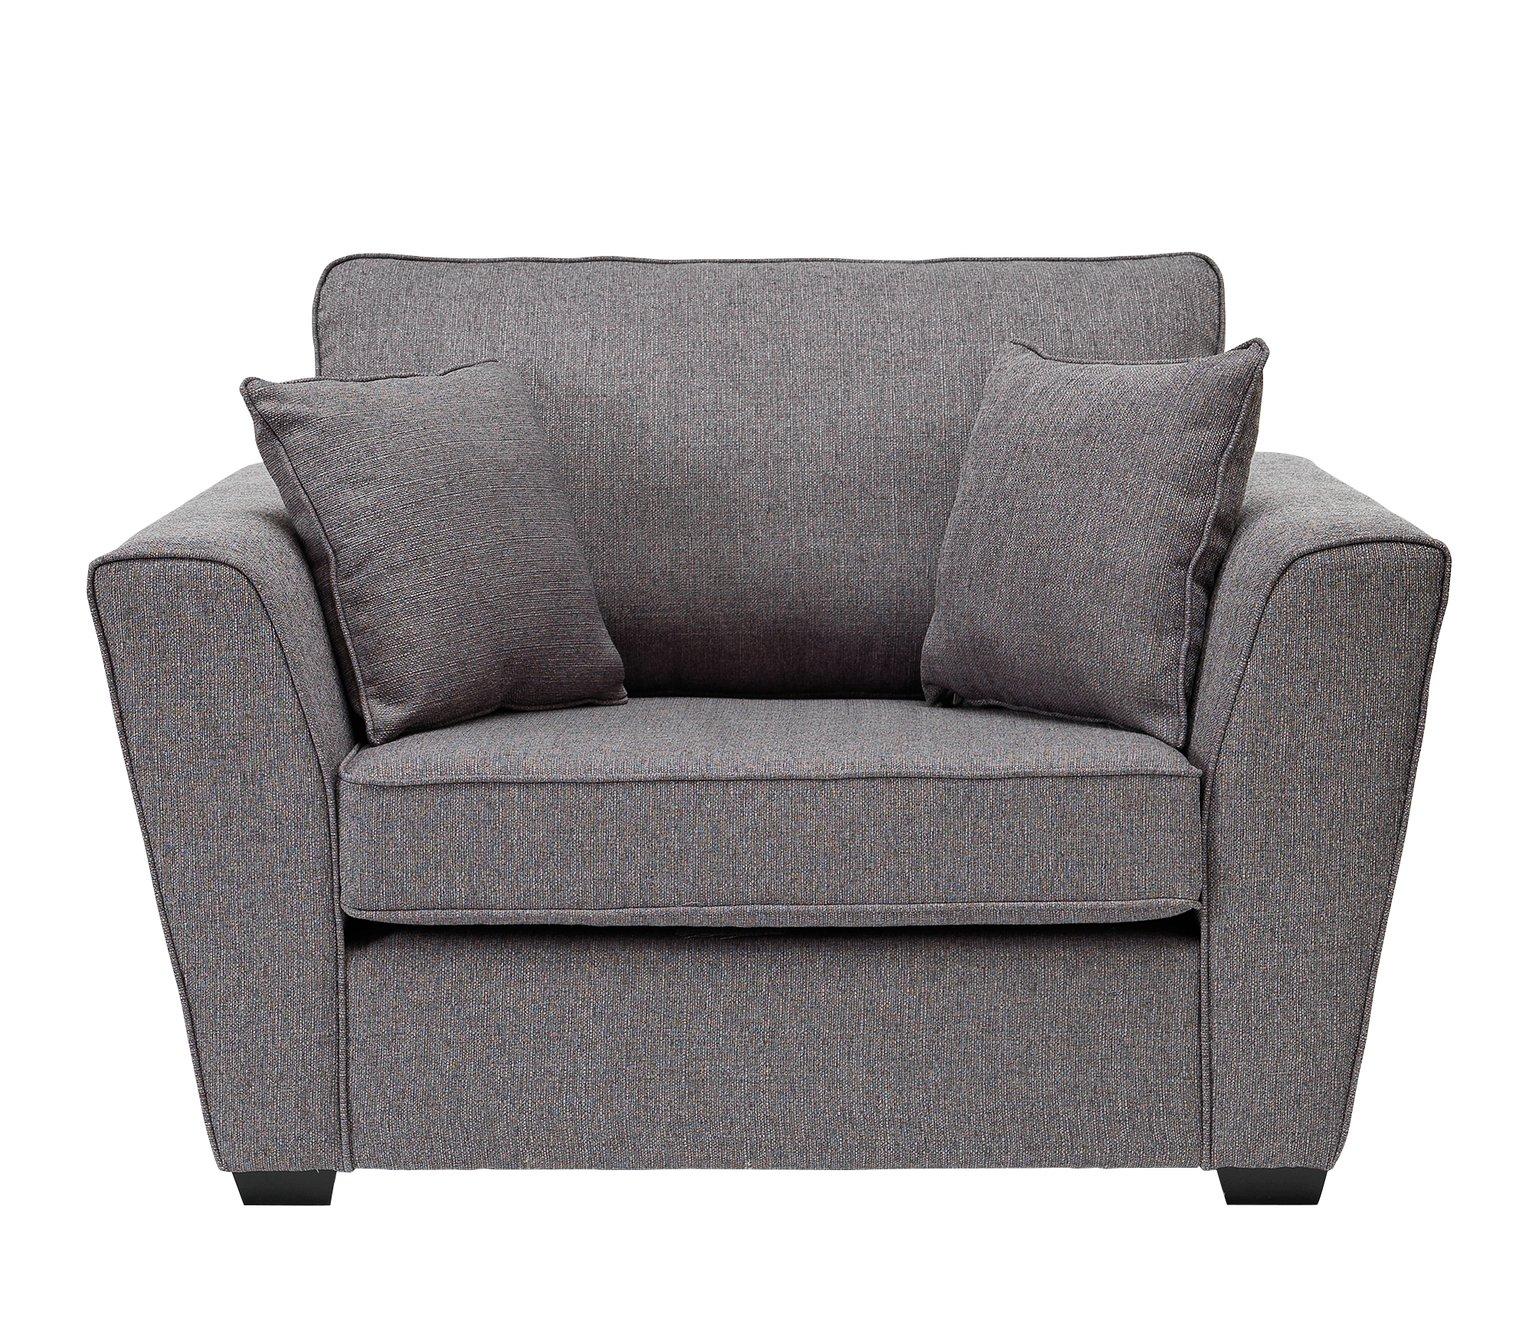 Argos Home Renley Fabric Cuddle Chair - Charcoal